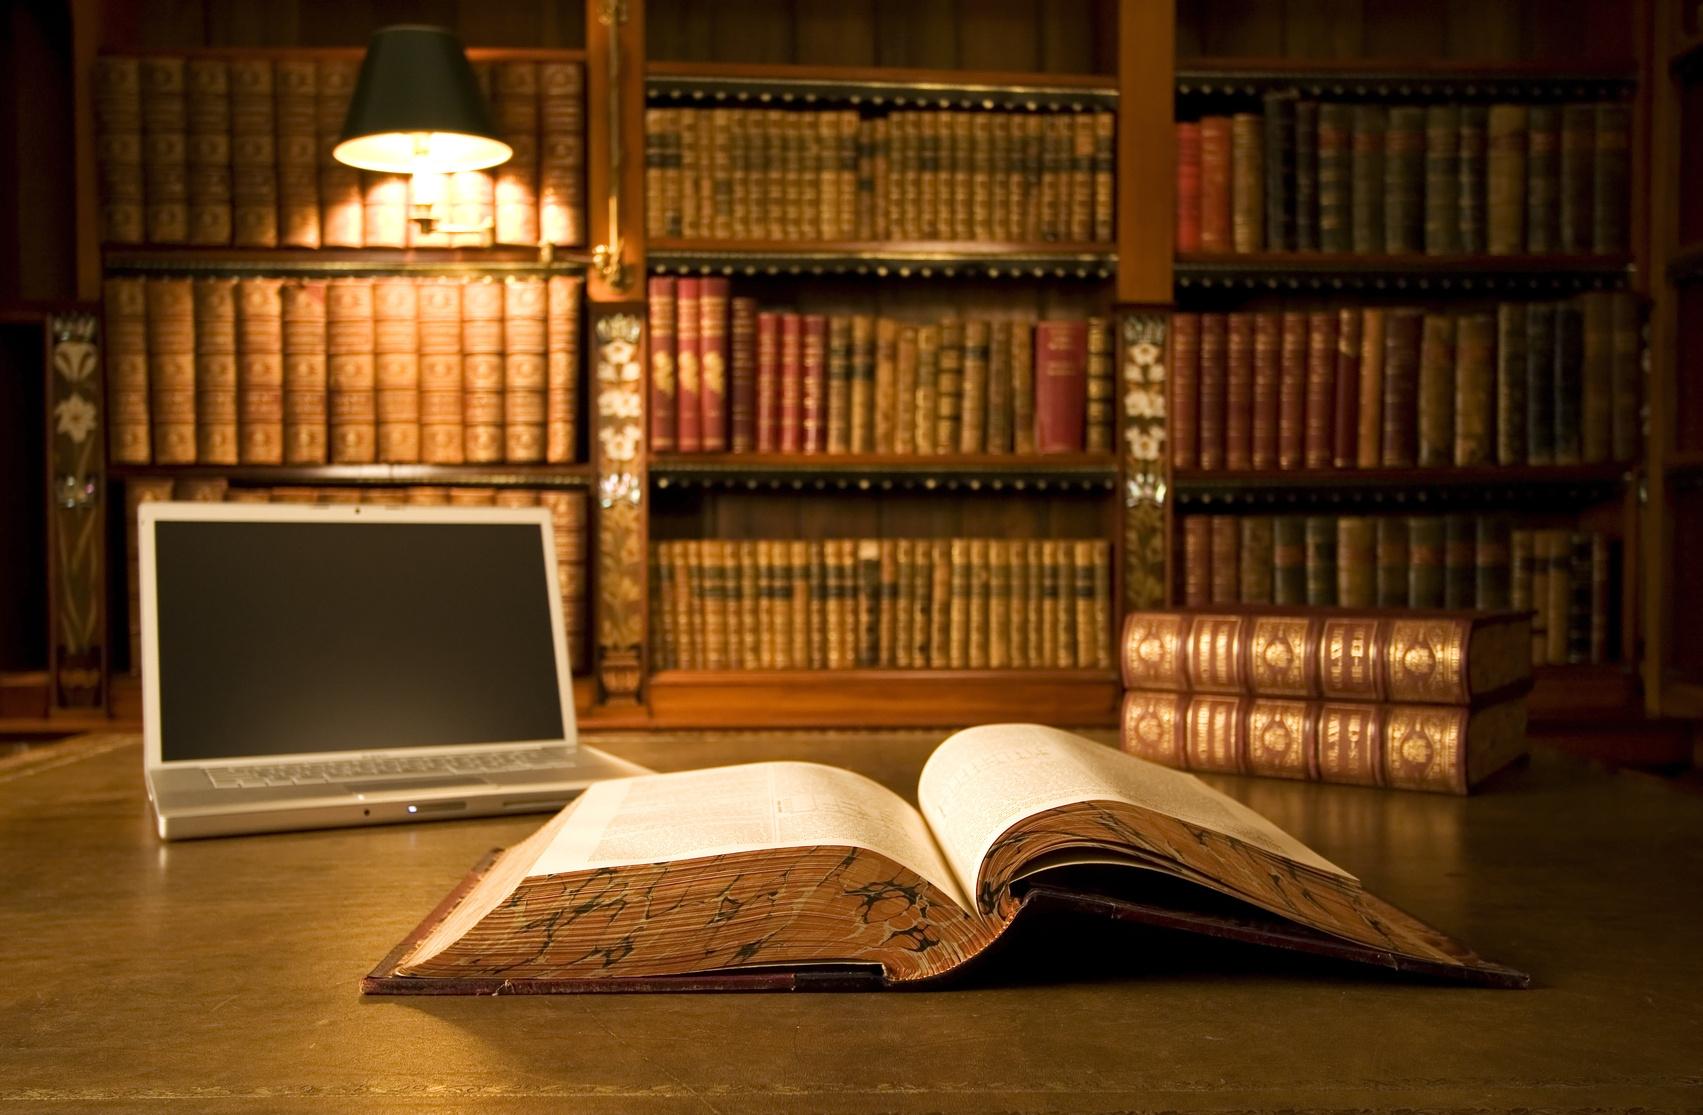 The Law Offices Of Mishari Al Ghazali Amp Rawan Al Ghazali 187 Library